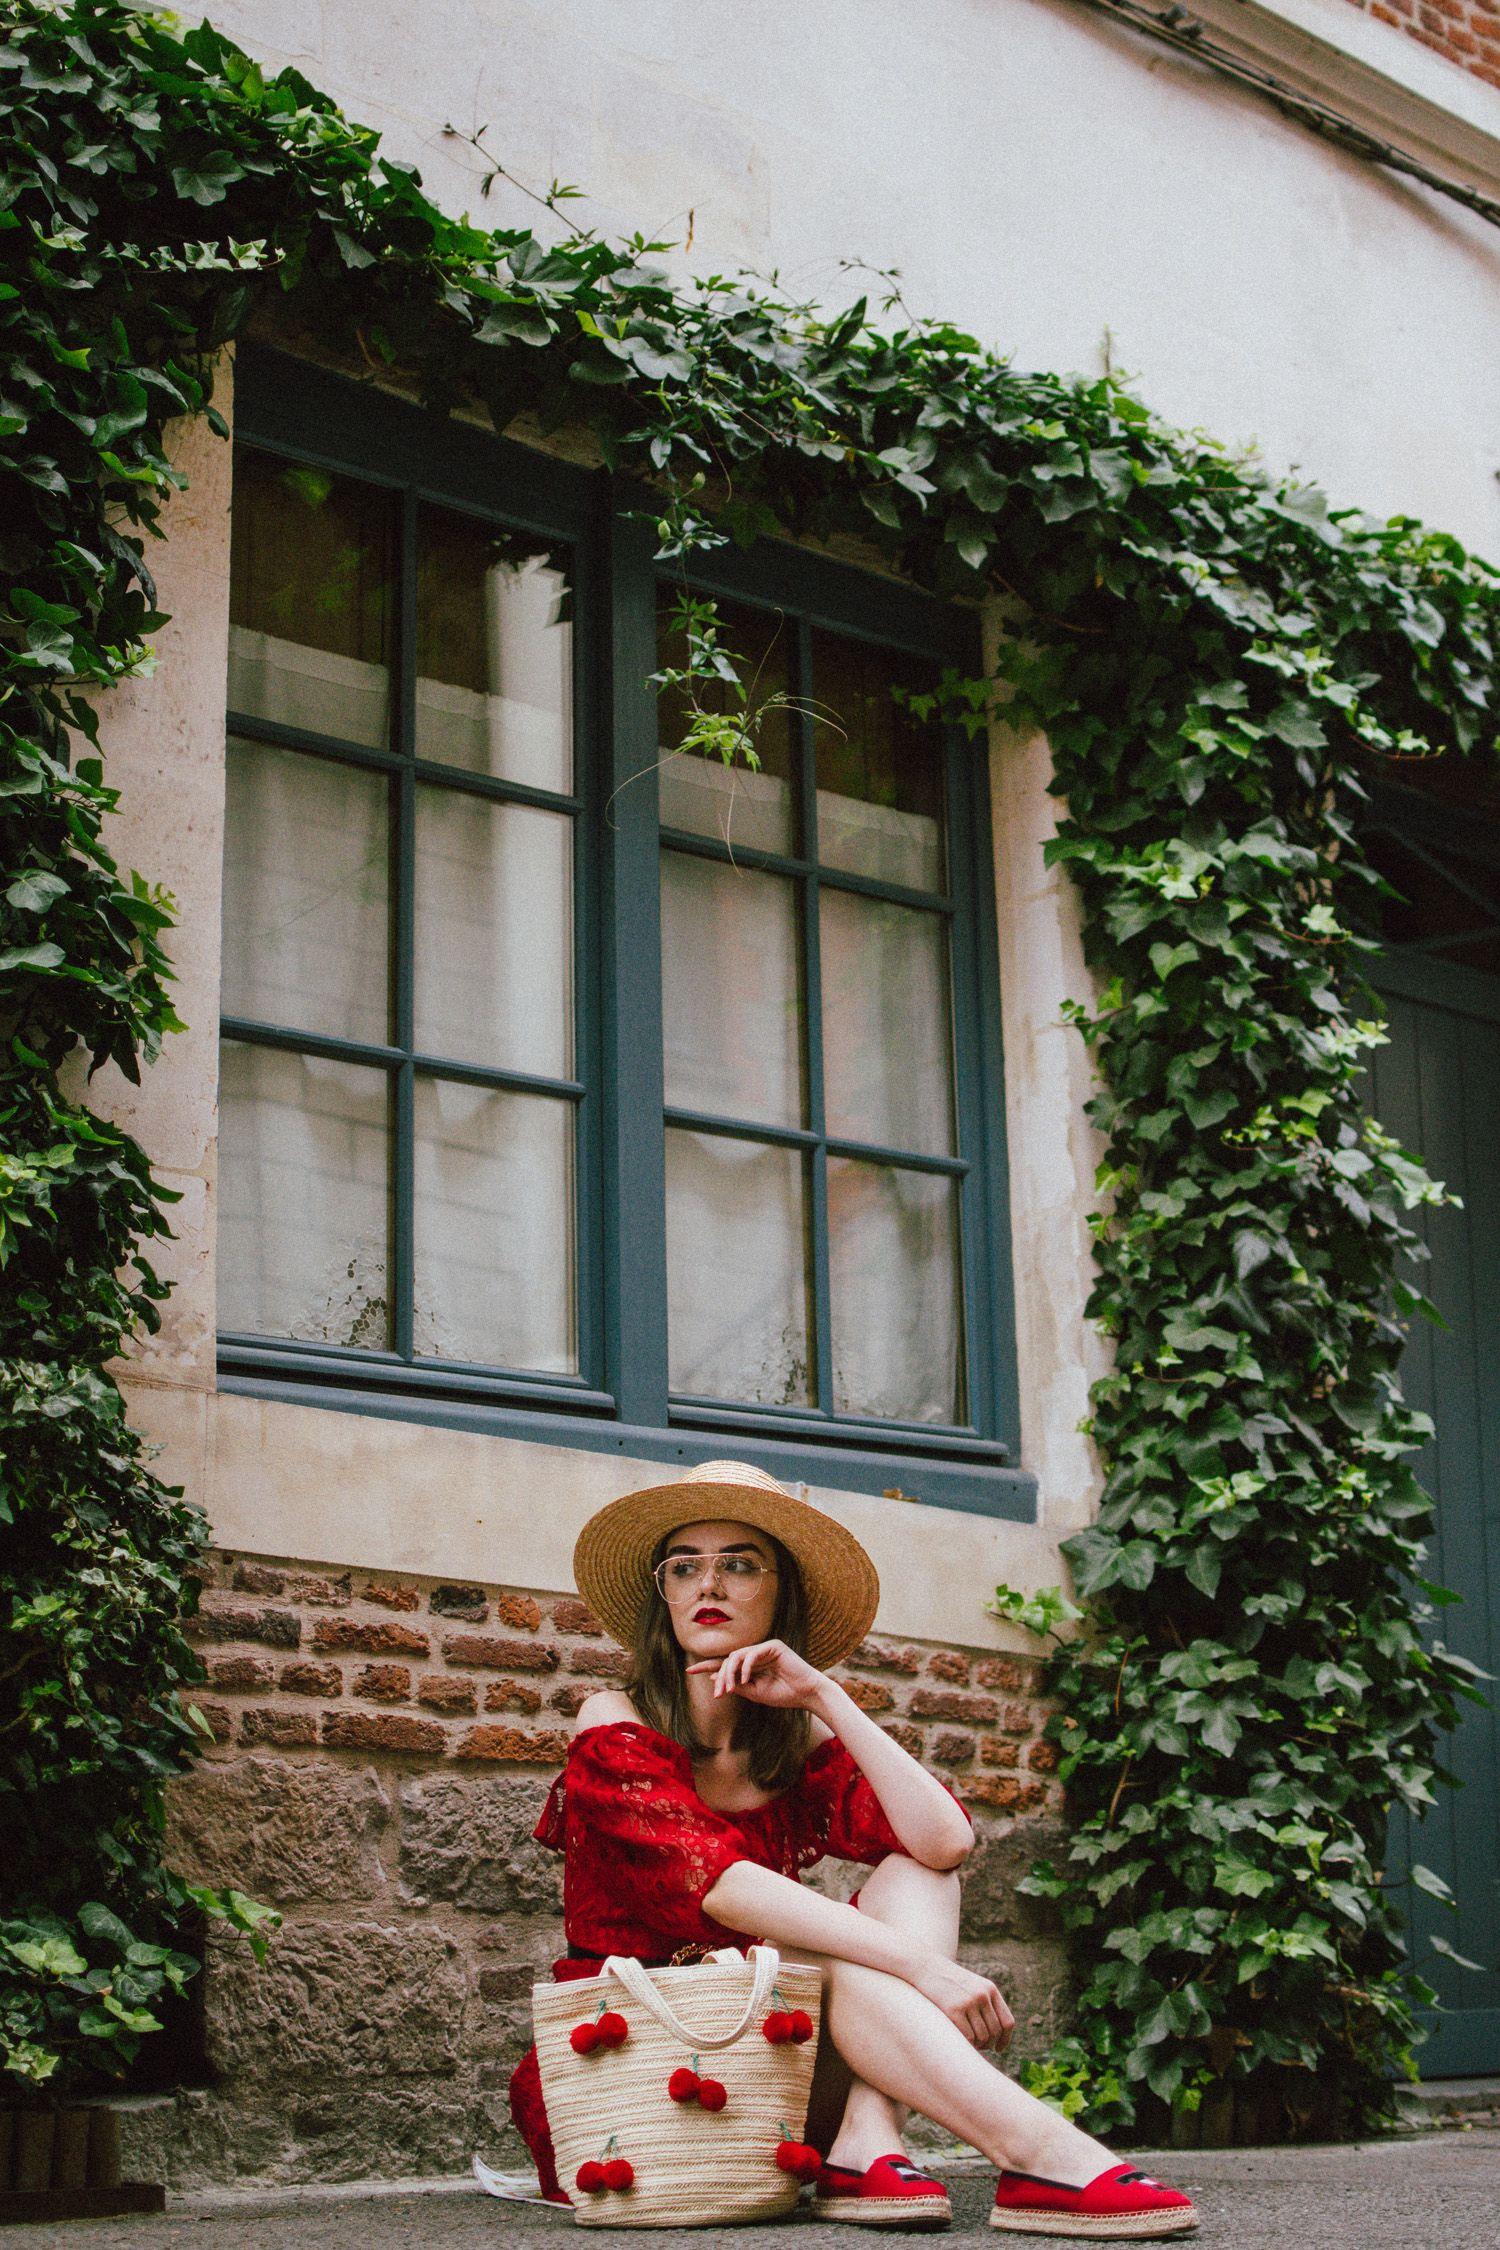 c4c1e547fb243 Zara red midi lace dress, ots dress, straw boater hat, red sequin T tommy  hilfiger espadrilles, cherry straw bag, france, andreea birsan, couturezilla,  ...